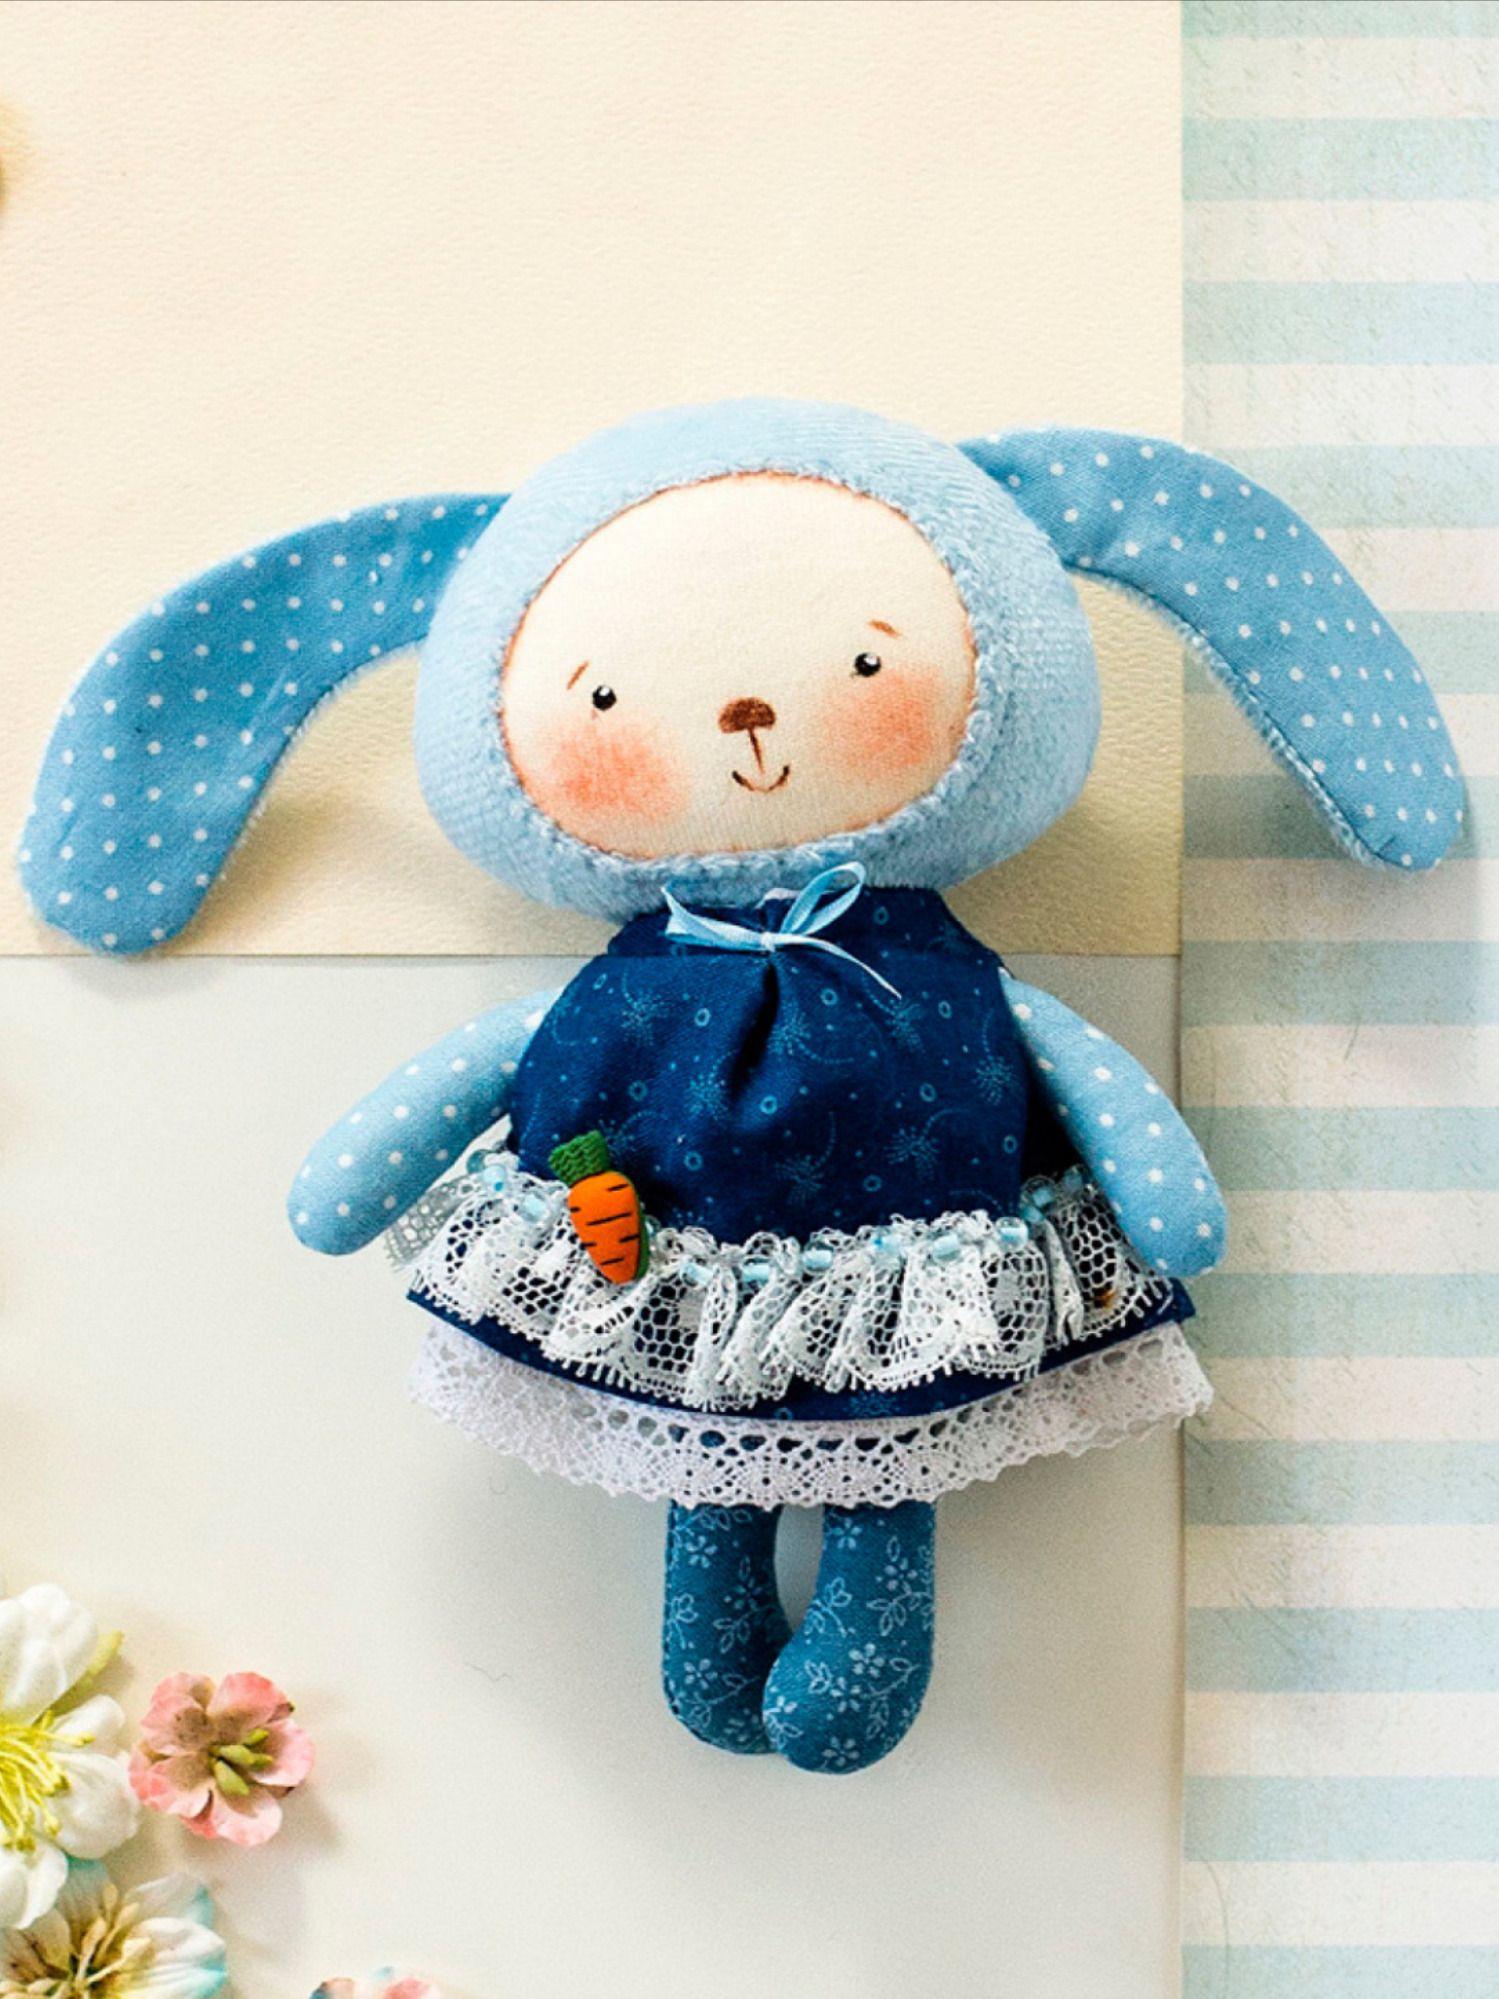 blue baby rabbit soft plushie stuffed plush cloth bunny newborn rag doll fabric animal nursery decor Textile organic bunny softie toy